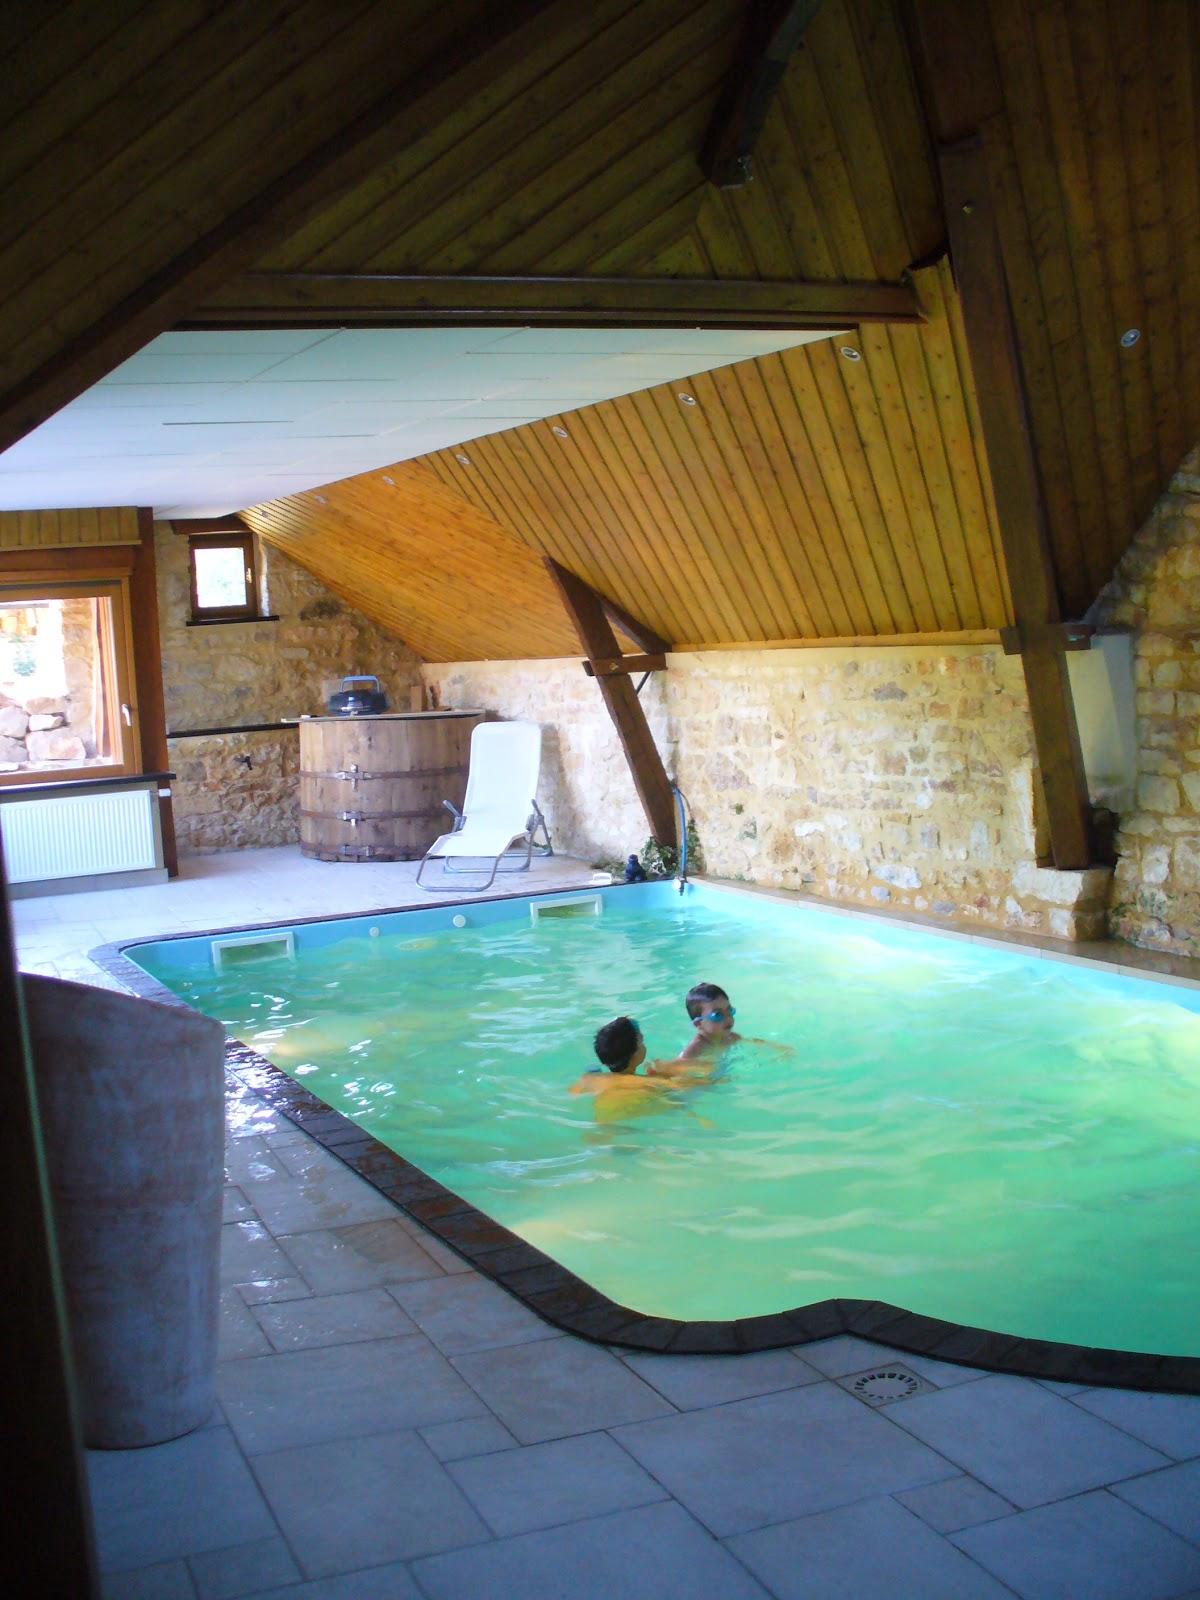 Acasadiclara la casa con la piscina dentro i miss for Case moderne con piscina